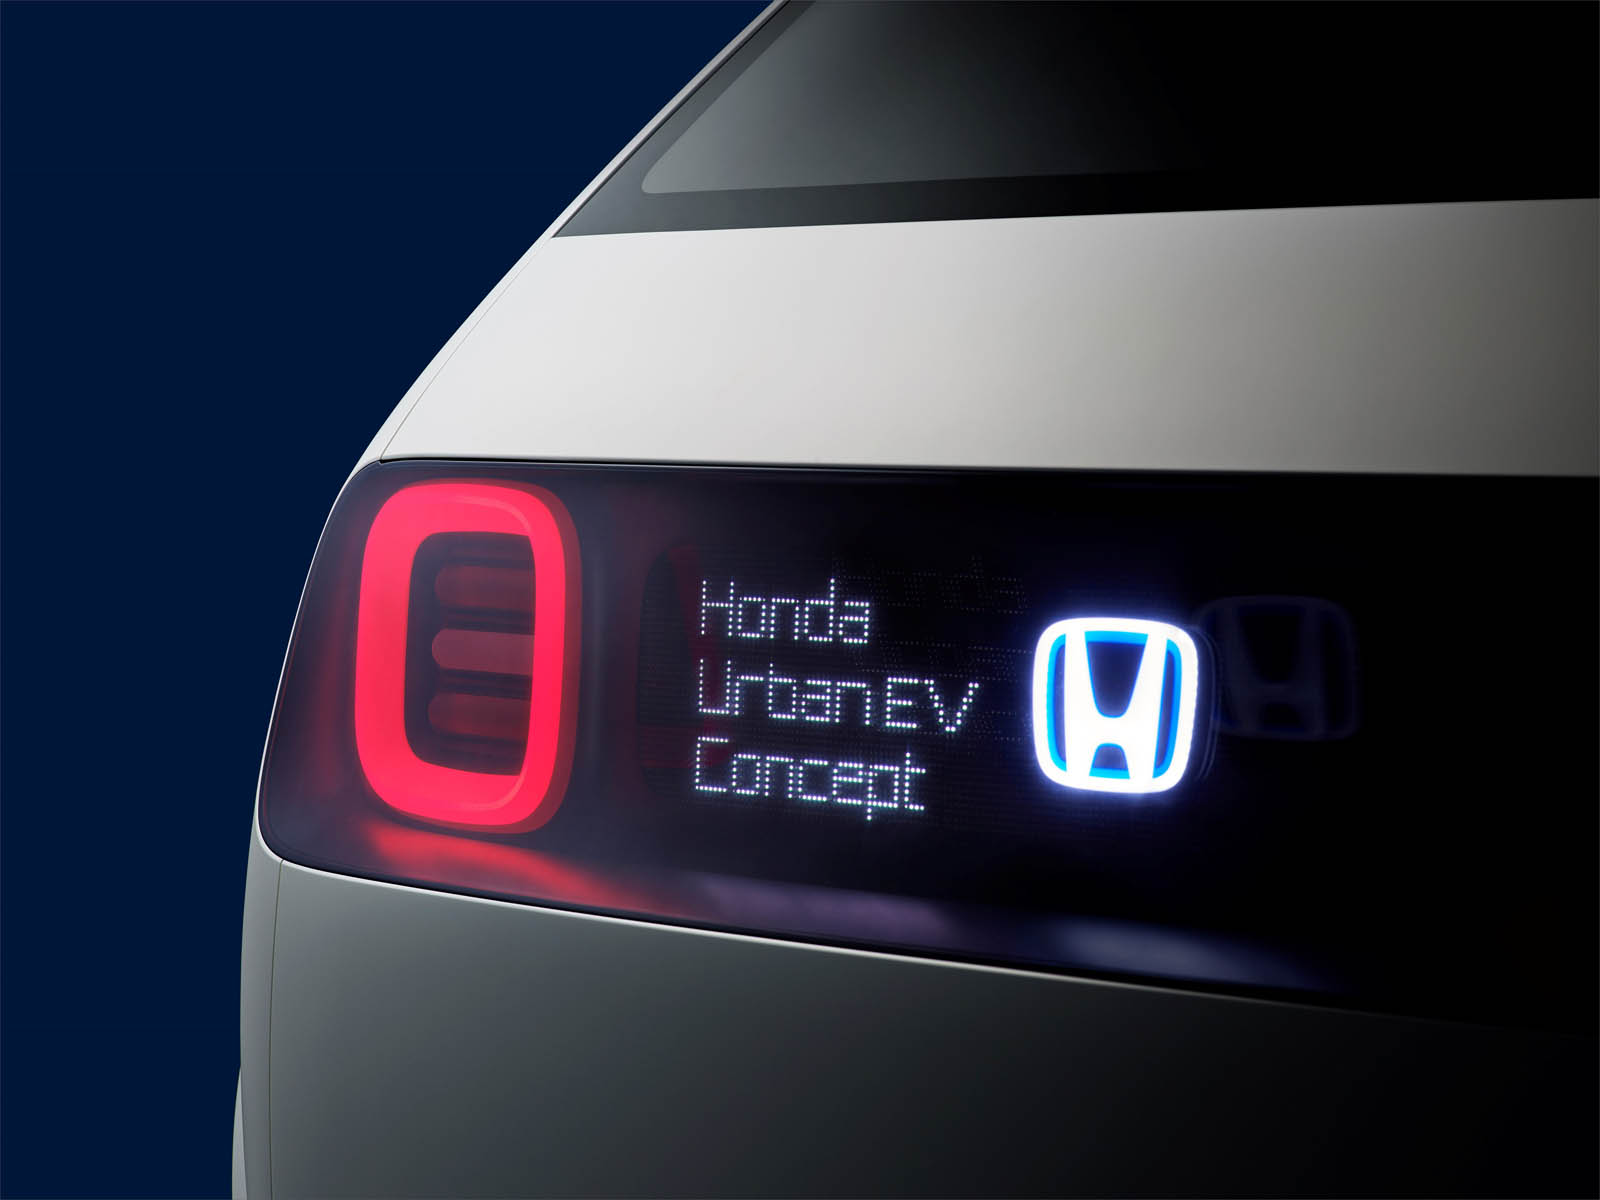 113875_Honda_Urban_EV_Concept_unveiled_at_the_Frankfurt_Motor_Show copy.jpg